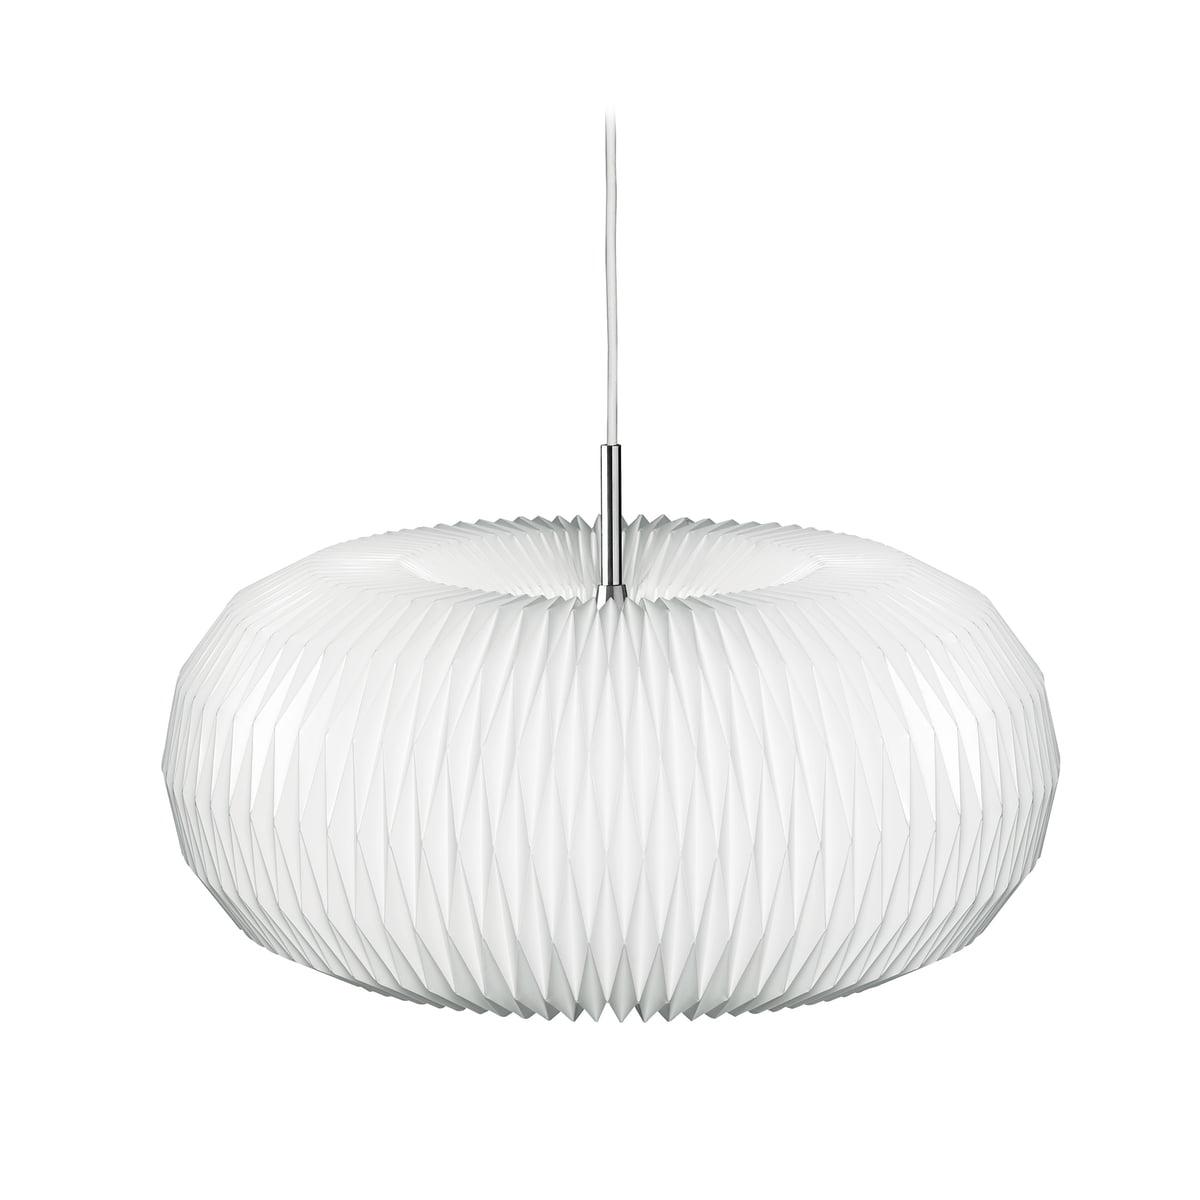 le klint lighting. Small Donut Pendant Lamp Ø 47cm By Le Klint Lighting 1